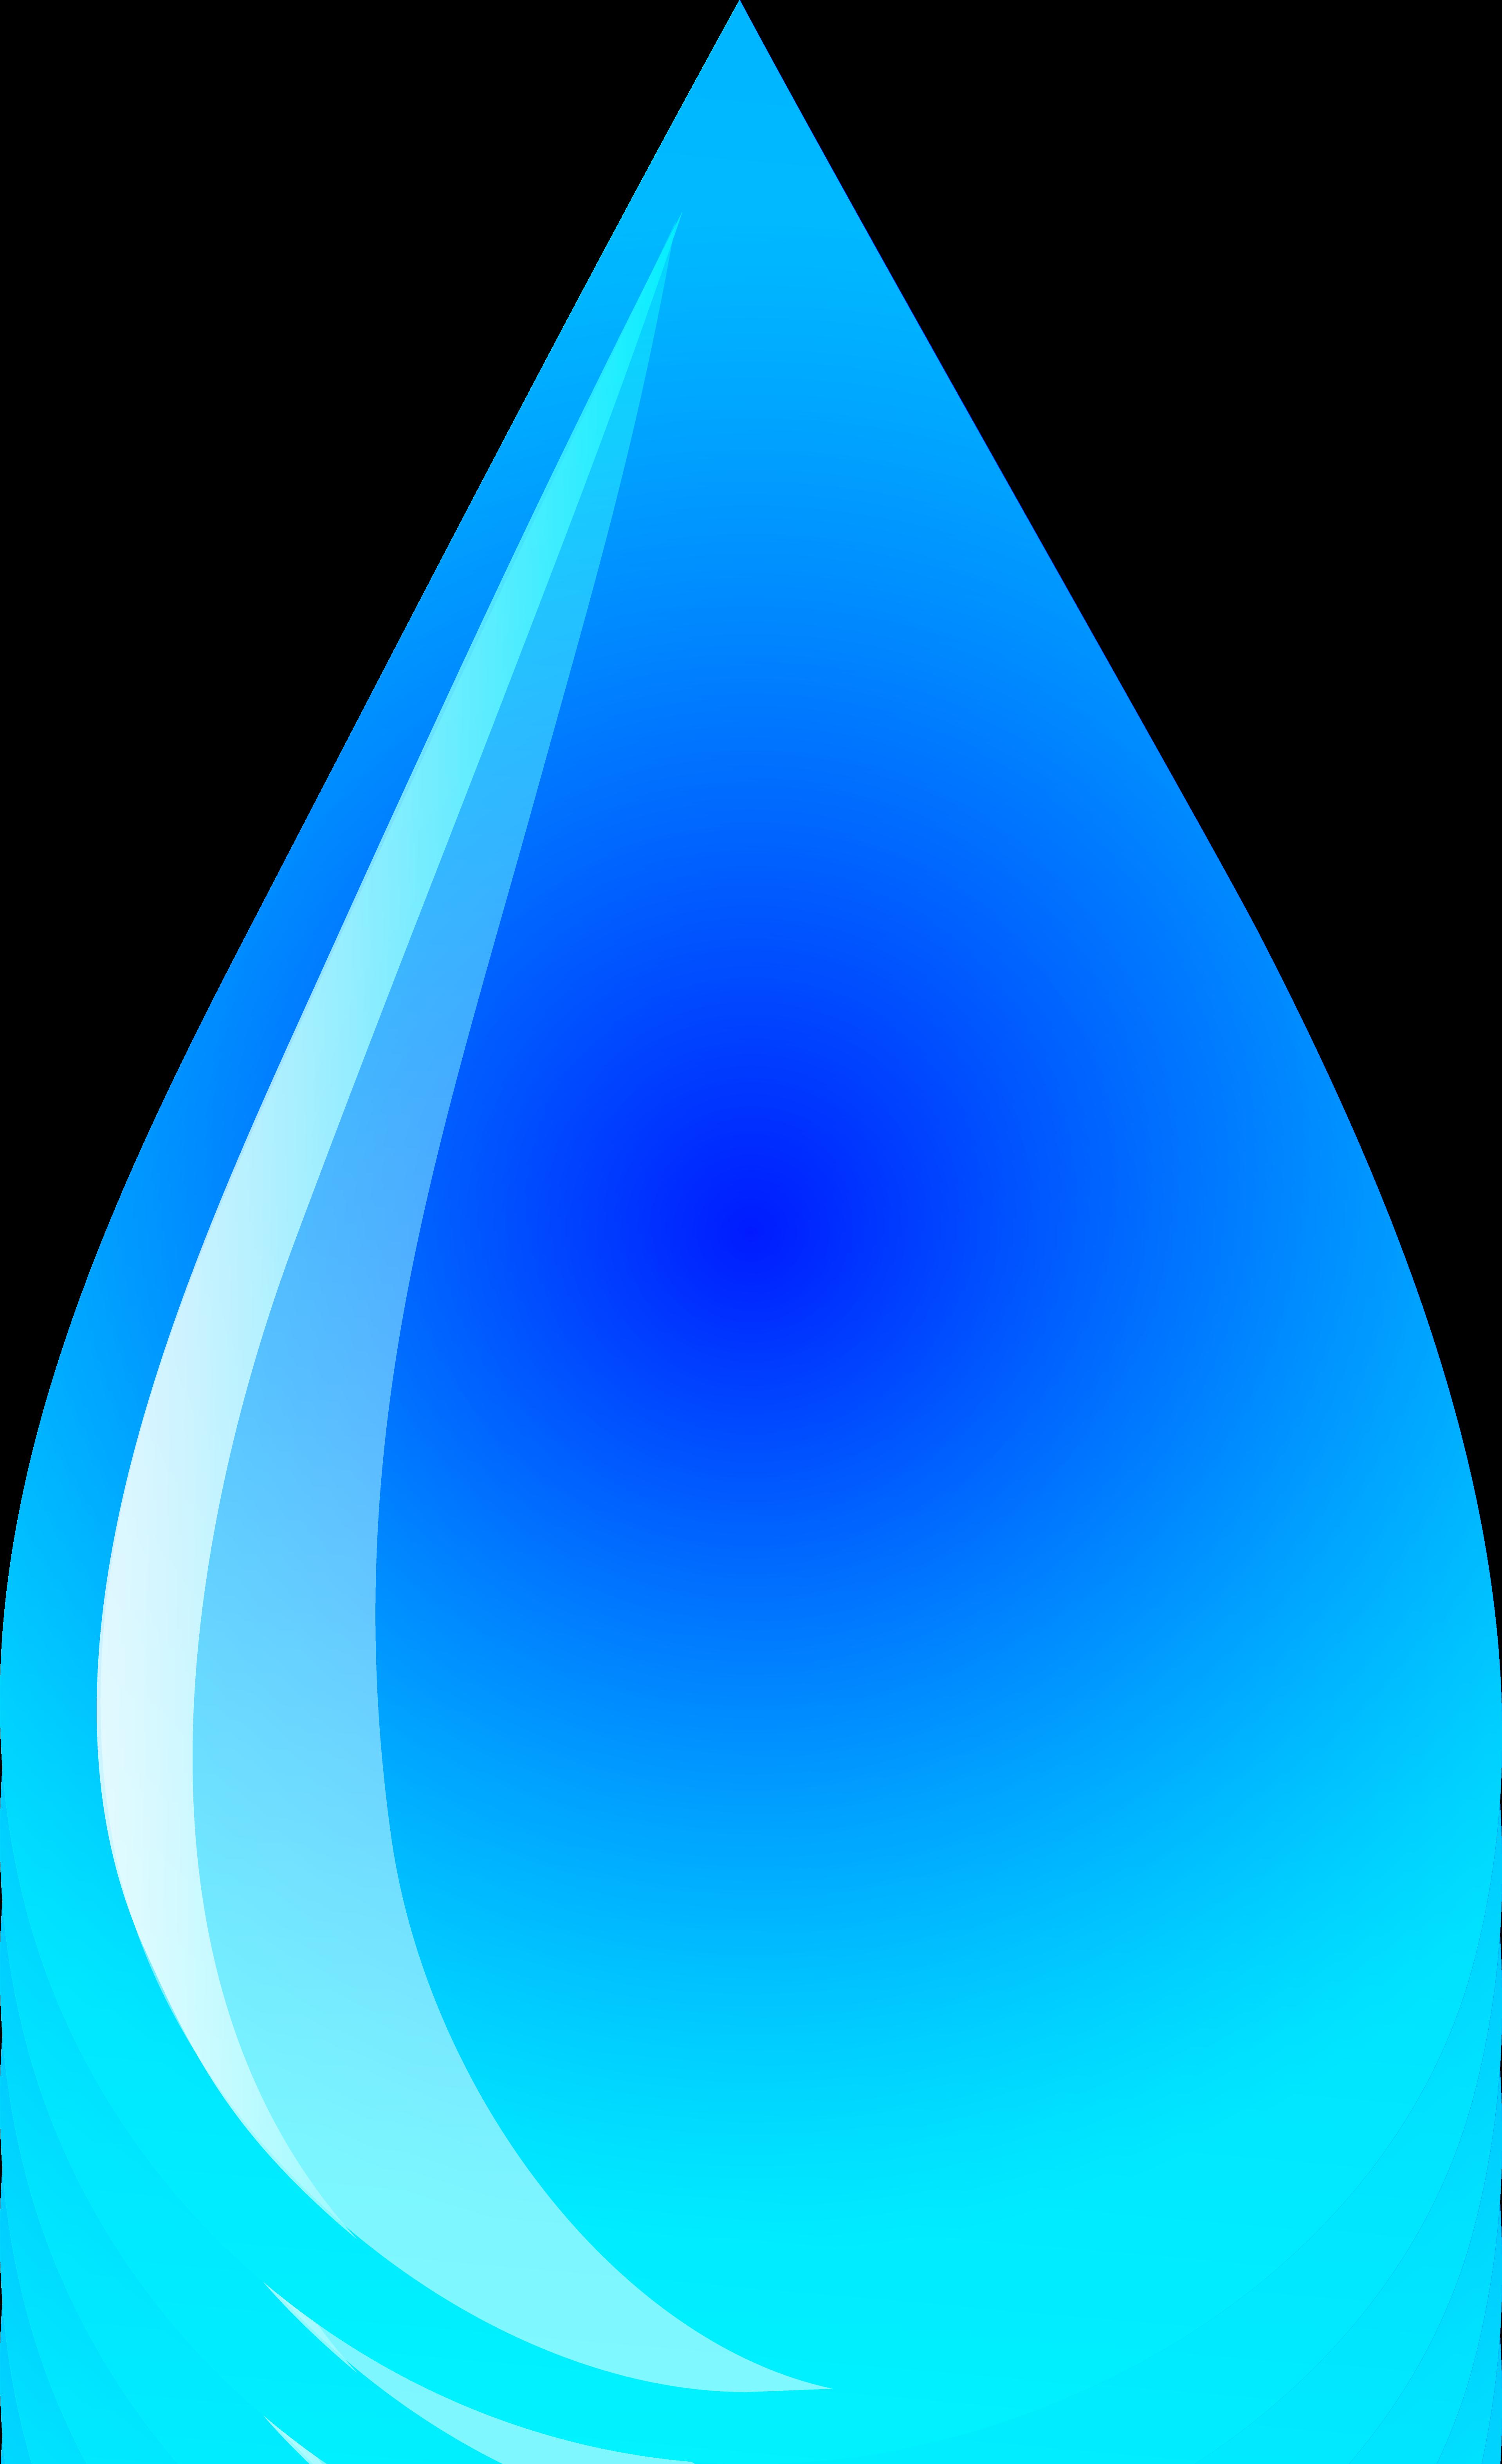 download Drops transparent background free. Drop clipart.